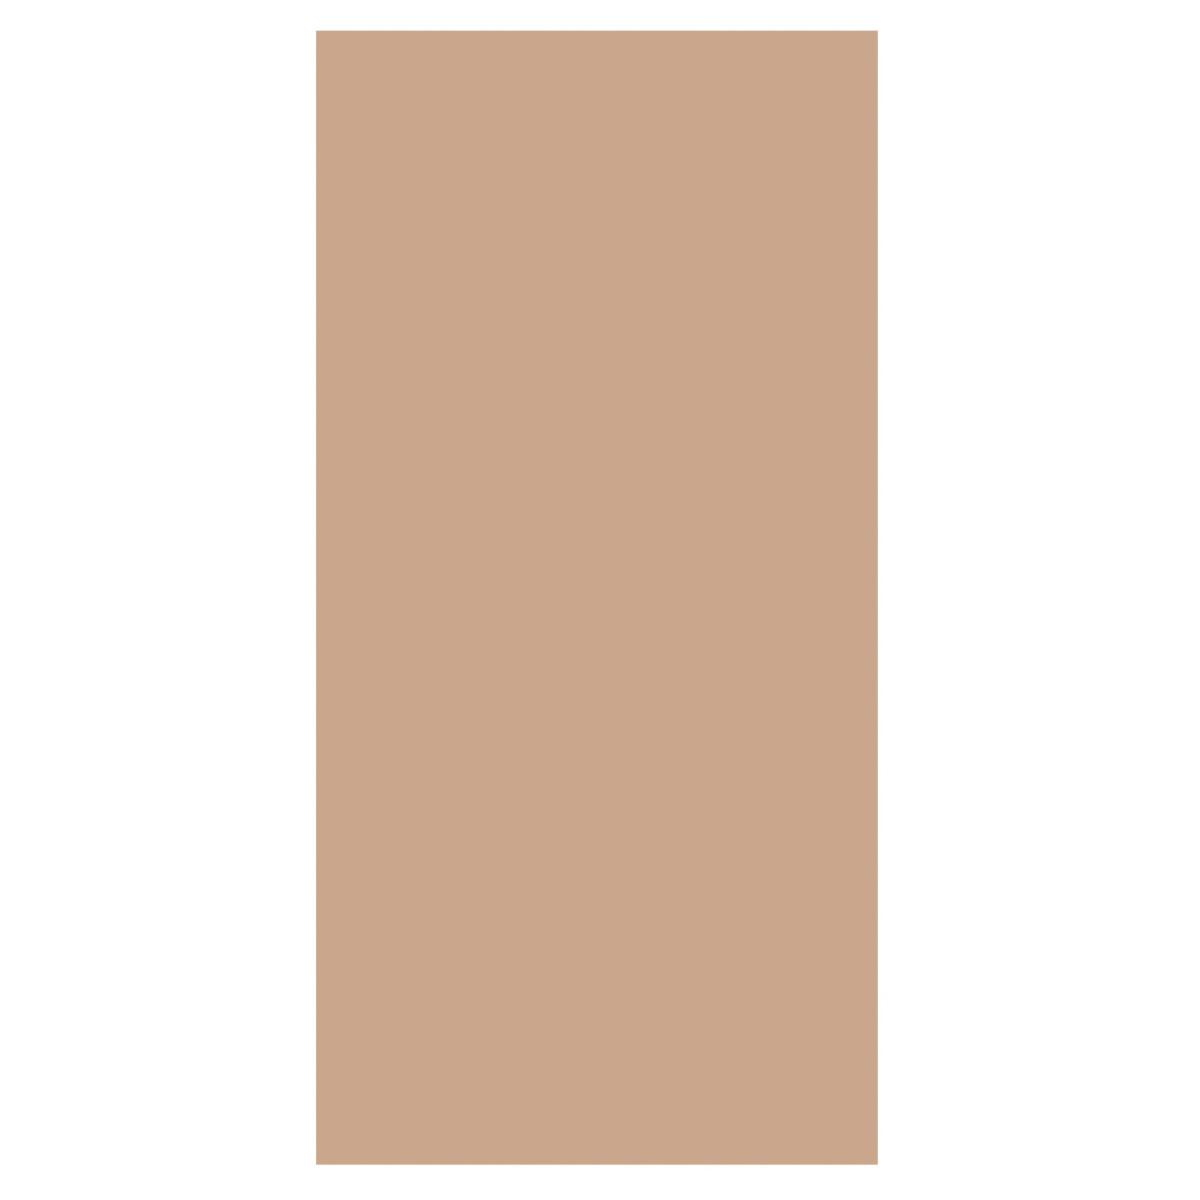 Дверь для шкафа Delinia «Капучино» 40x92 см ЛДСП цвет бежевый